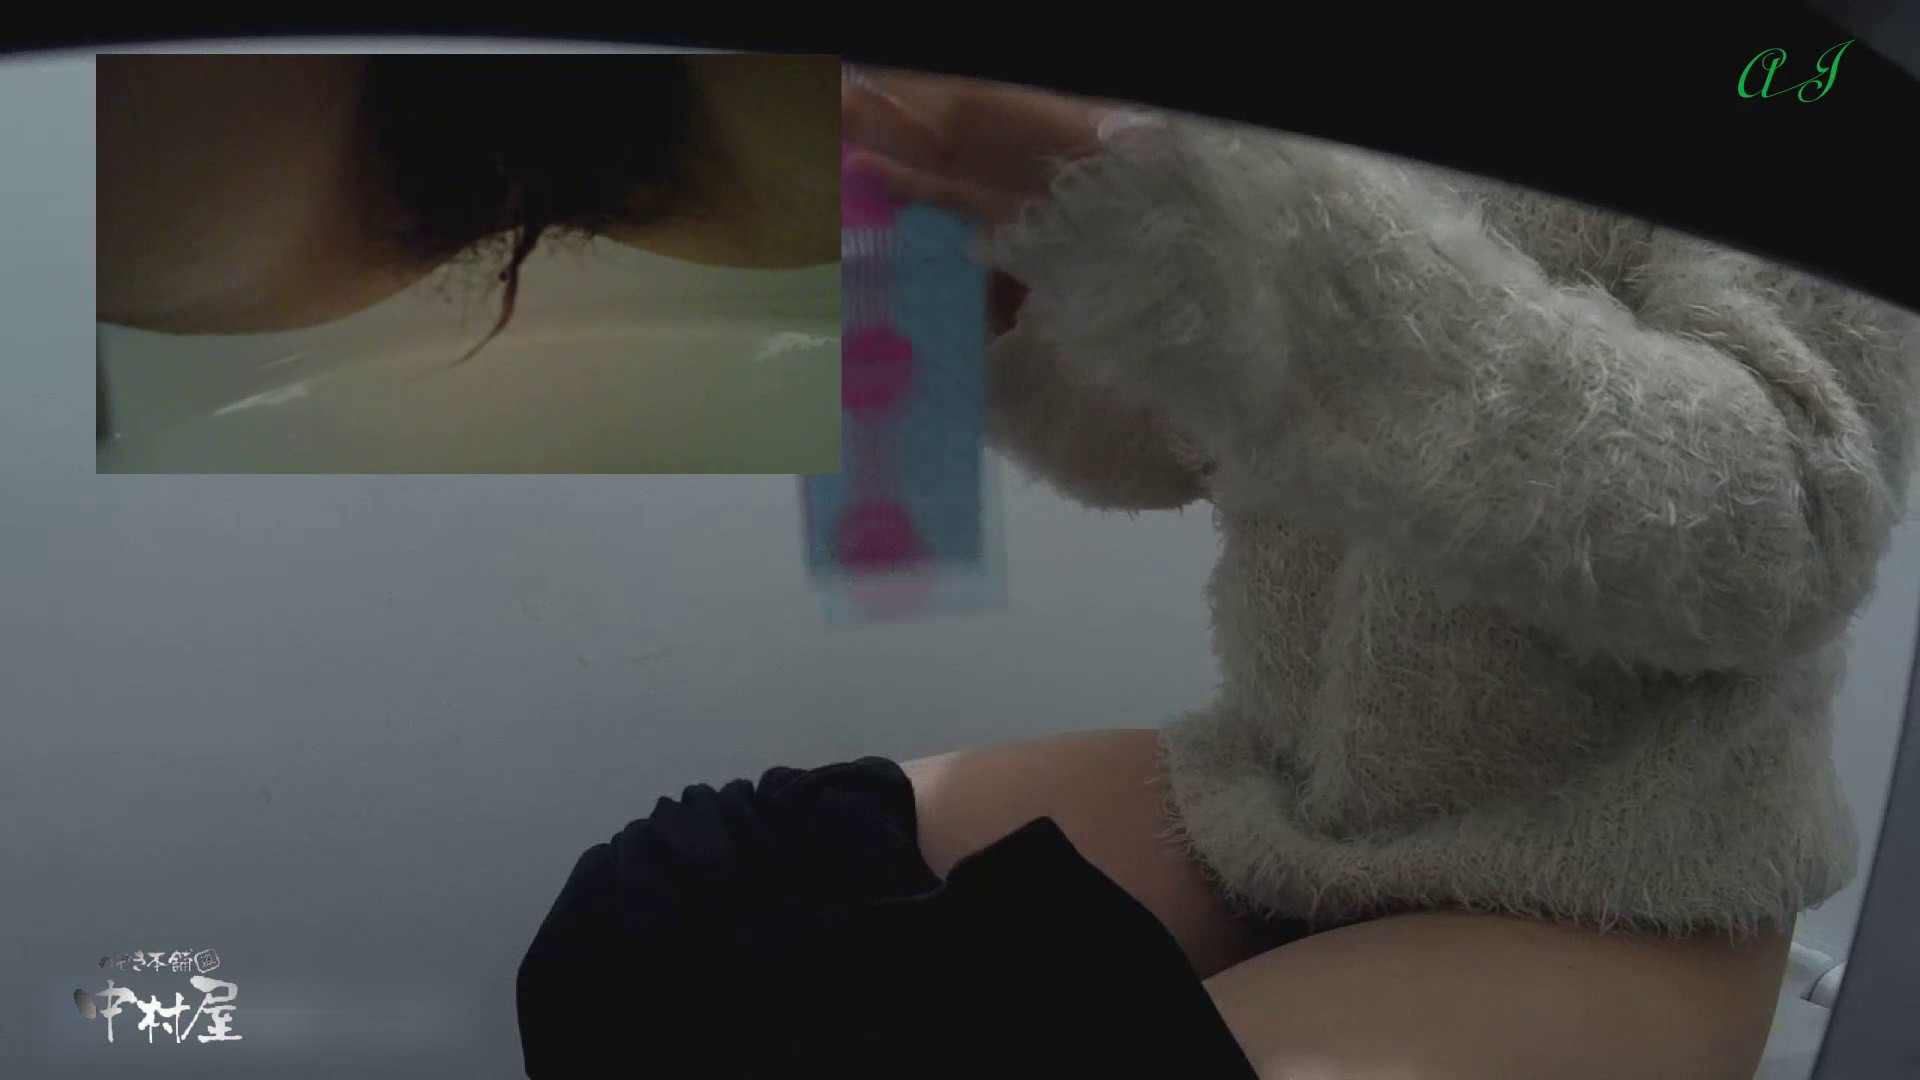 有名大学女性洗面所 vol.82 前編 洗面所 オメコ動画キャプチャ 81連発 28